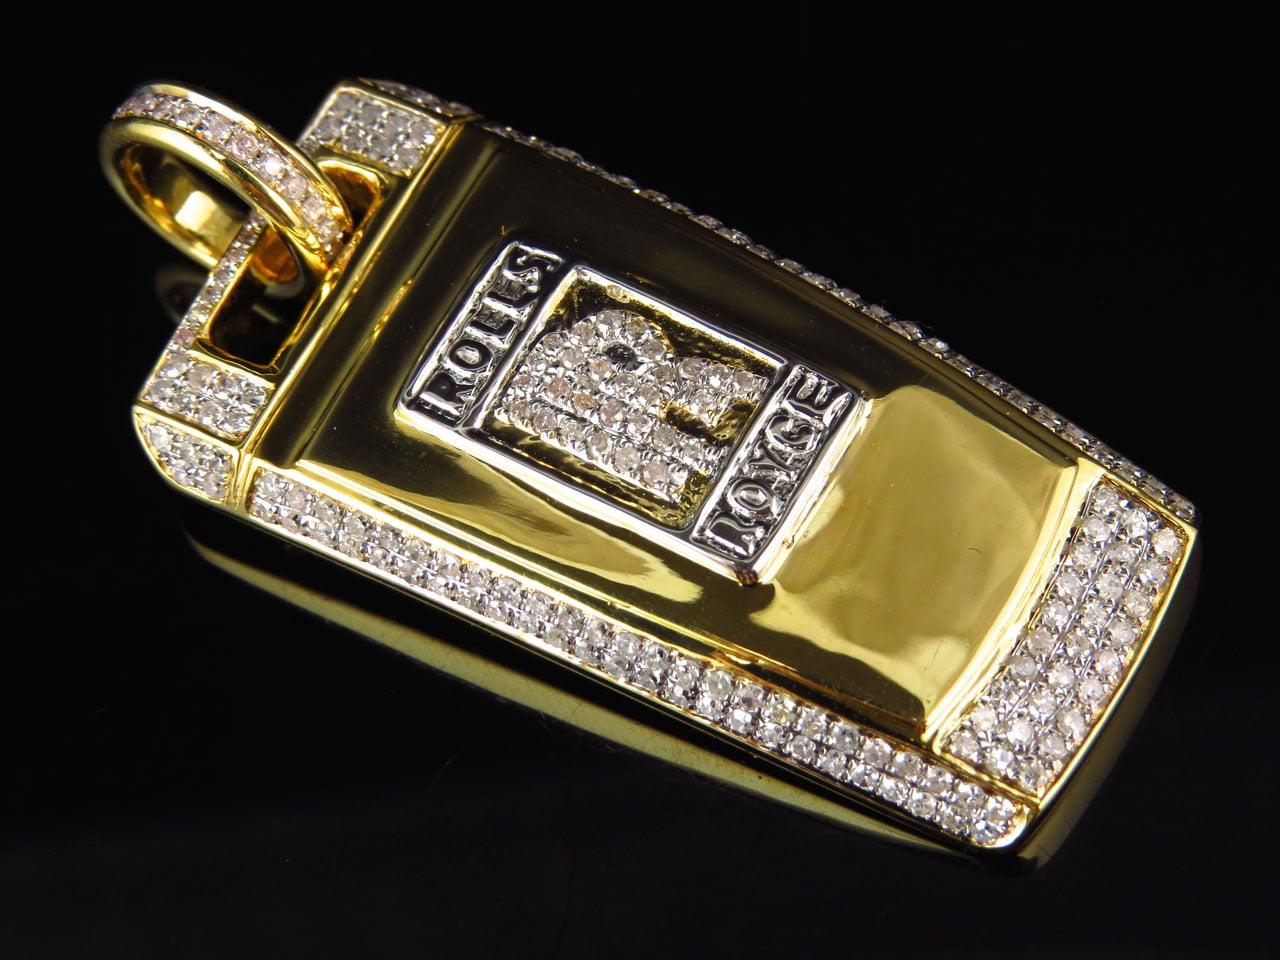 Custom rolls royce key pendant in 10k yellow gold 150 ct custom rolls royce key pendant in 10k yellow gold 150 ct walmart aloadofball Choice Image